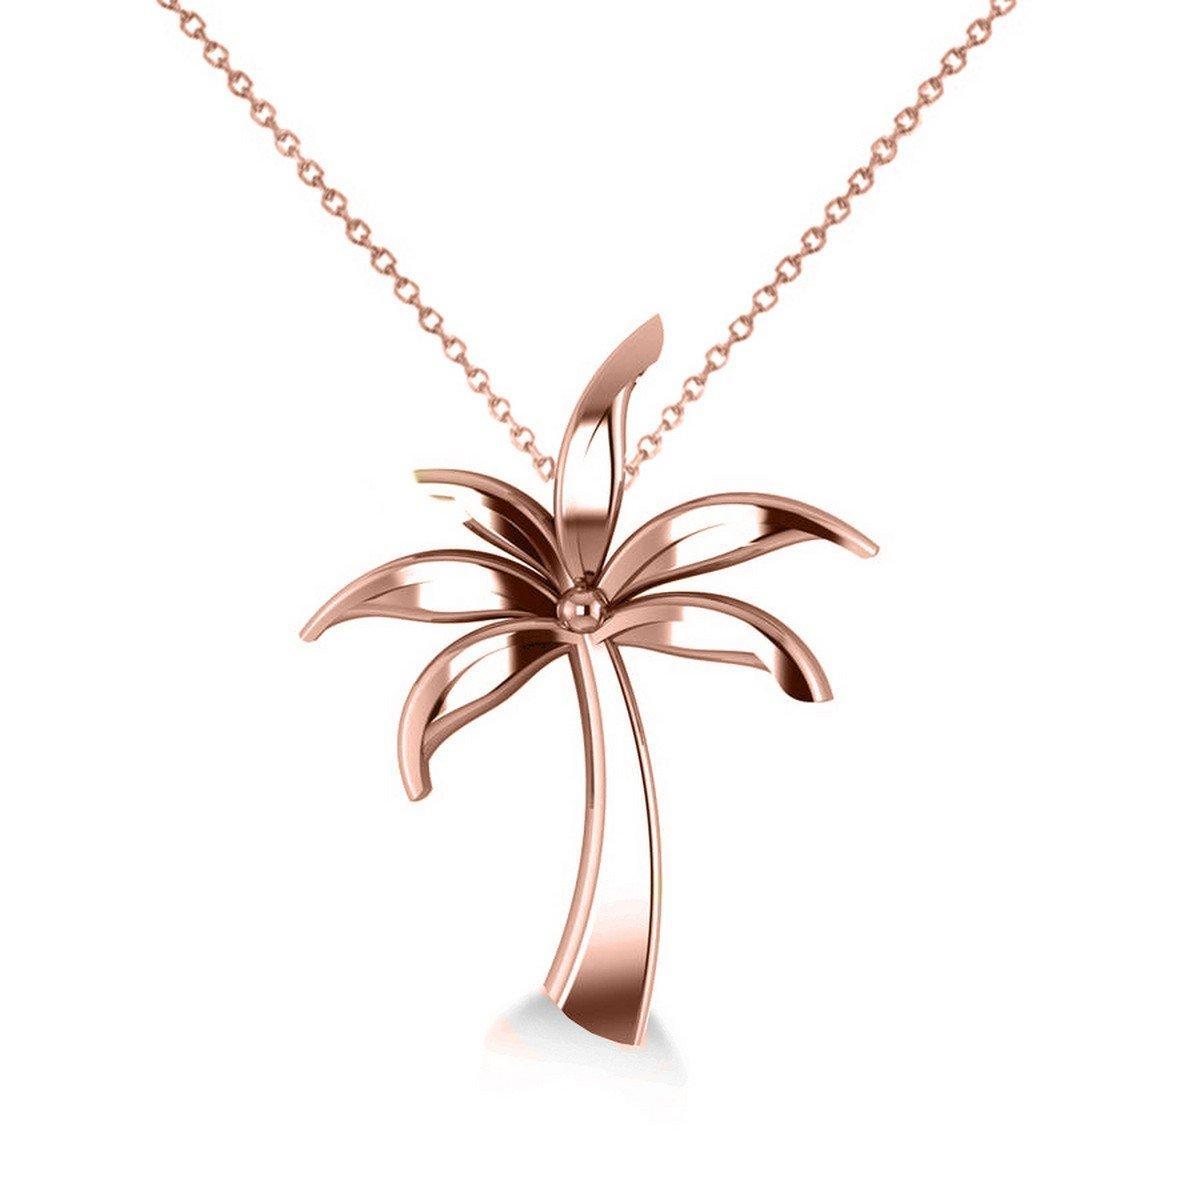 Allurez Summer Palm Tree Ladies Pendant Necklace in 14k Rose Gold